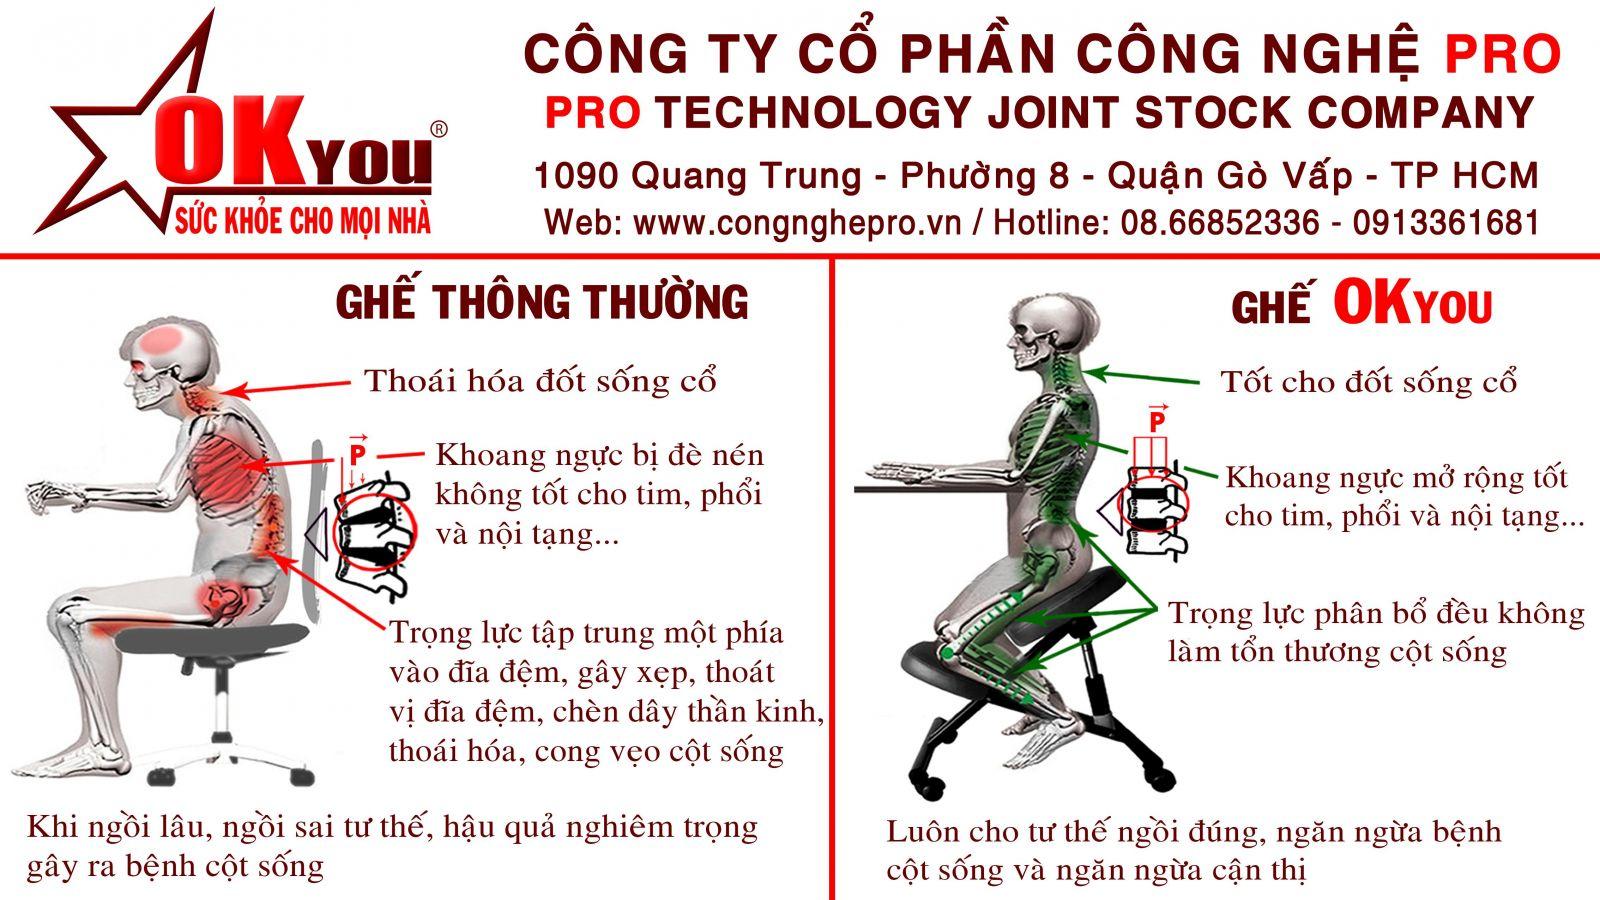 giai-phap-ho-tro-cot-song